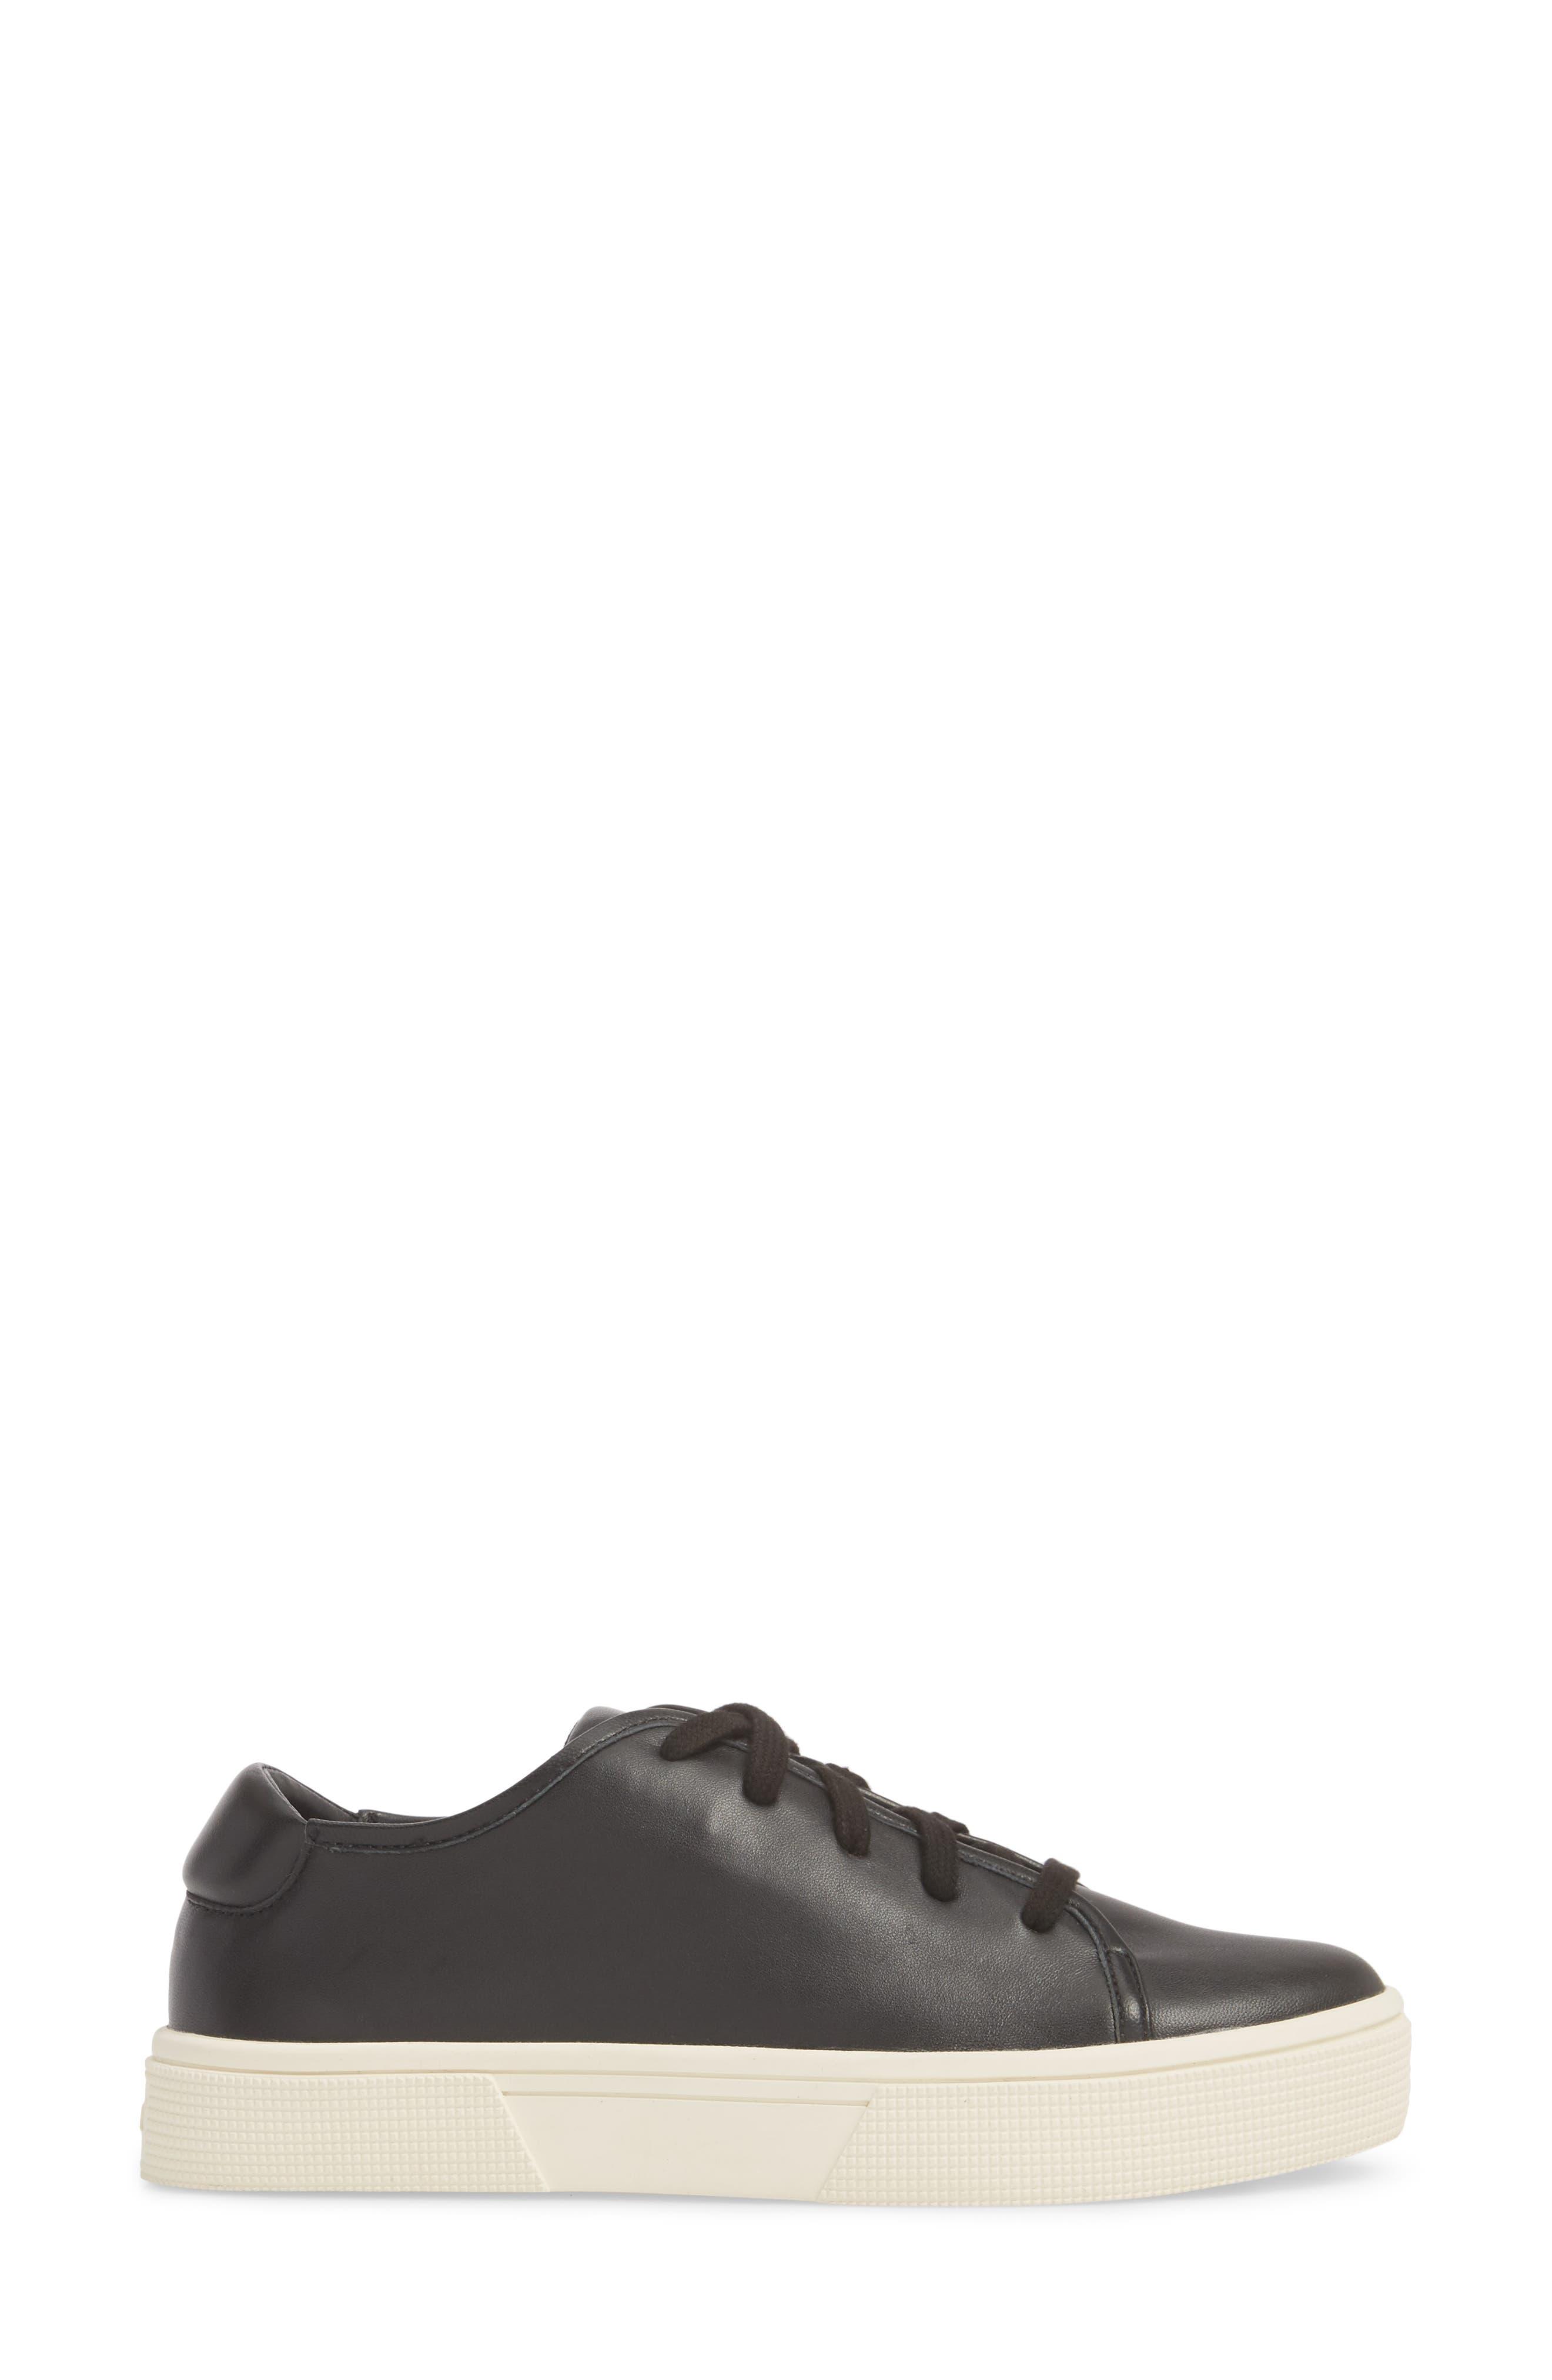 Norvin Sneaker,                             Alternate thumbnail 3, color,                             BLACK LEATHER